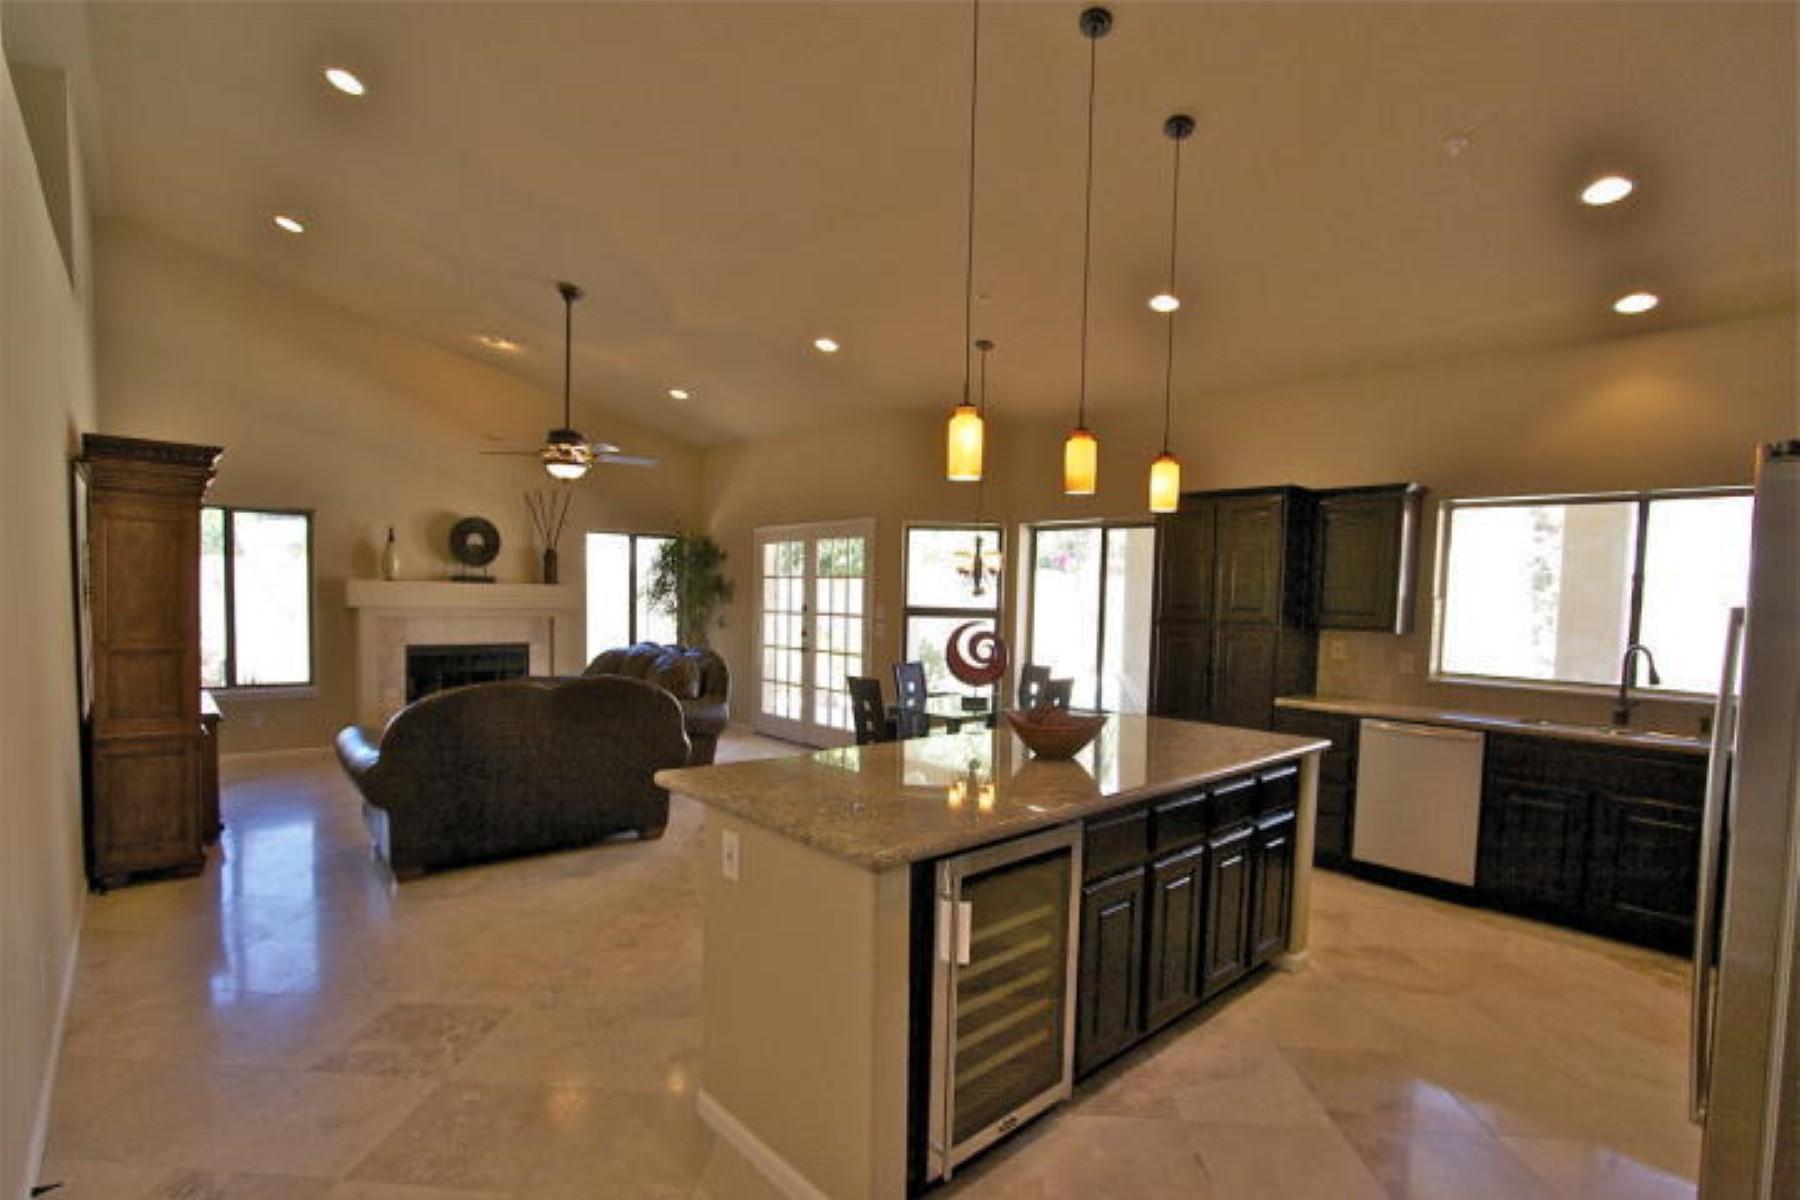 Casa para uma família para Venda às Luxurious home was completely remodeled in Scottsdale 10672 E Mission Ln Scottsdale, Arizona 85258 Estados Unidos